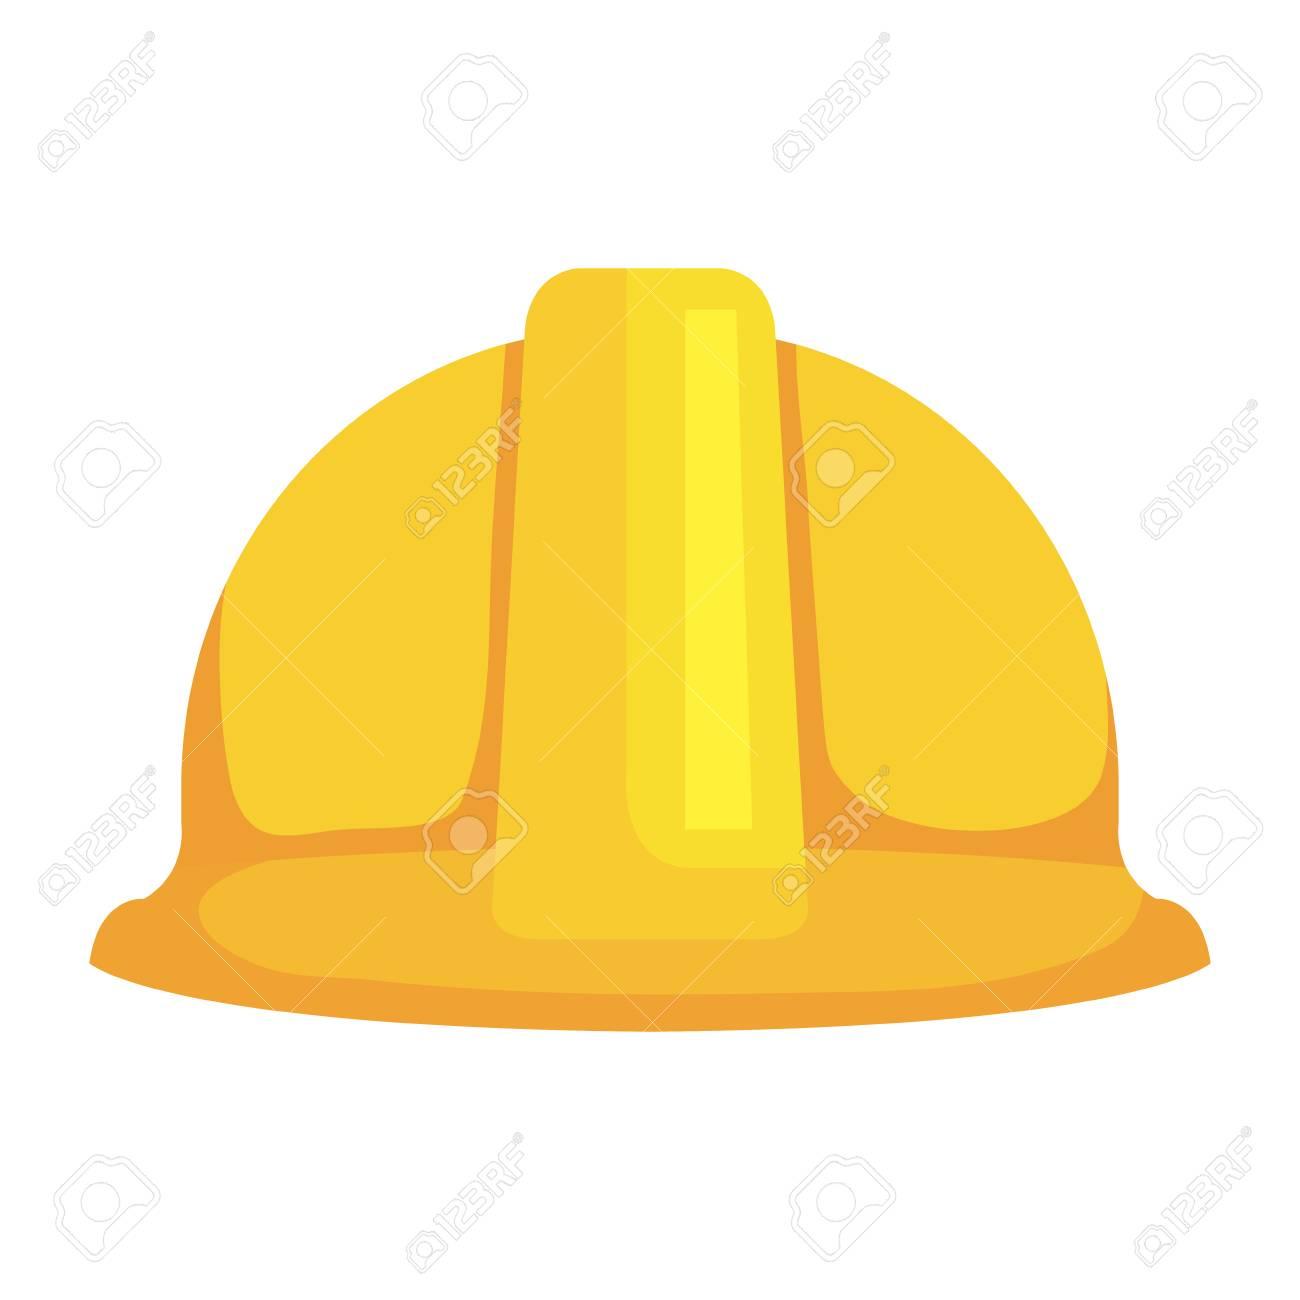 construction helmet protection icon vector illustration design - 123002411